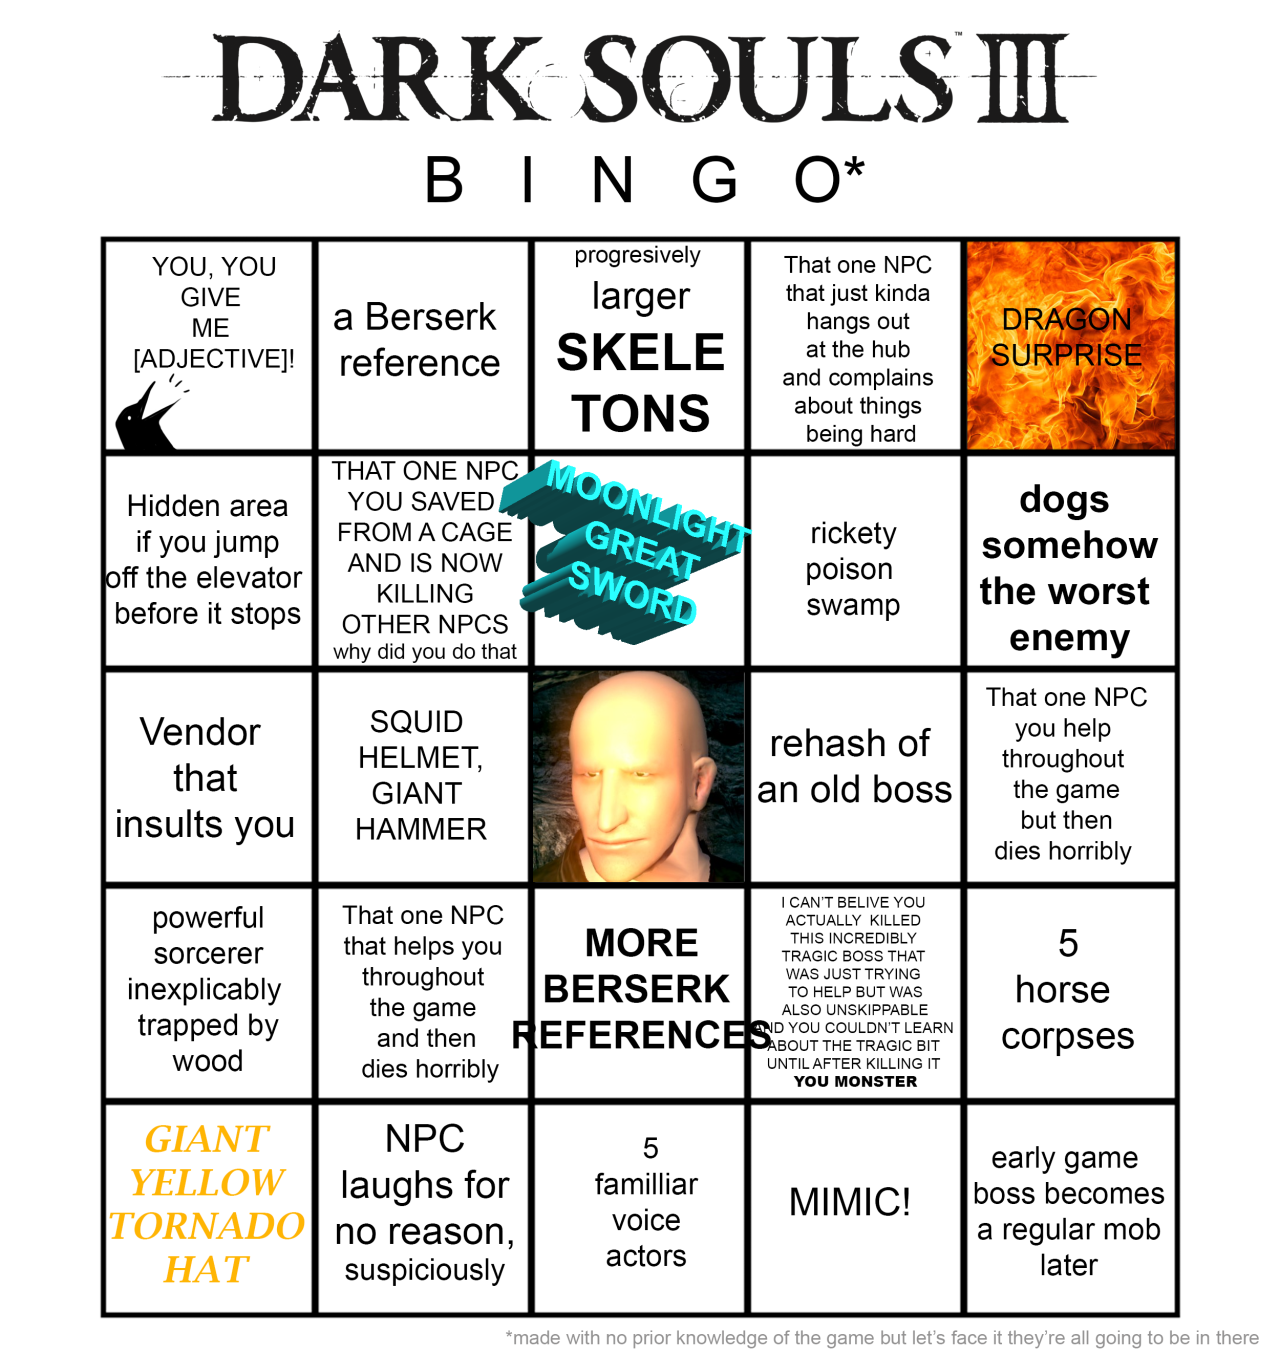 ef1 dark souls 3 bingo dark souls know your meme,Dark Souls 3 Memes